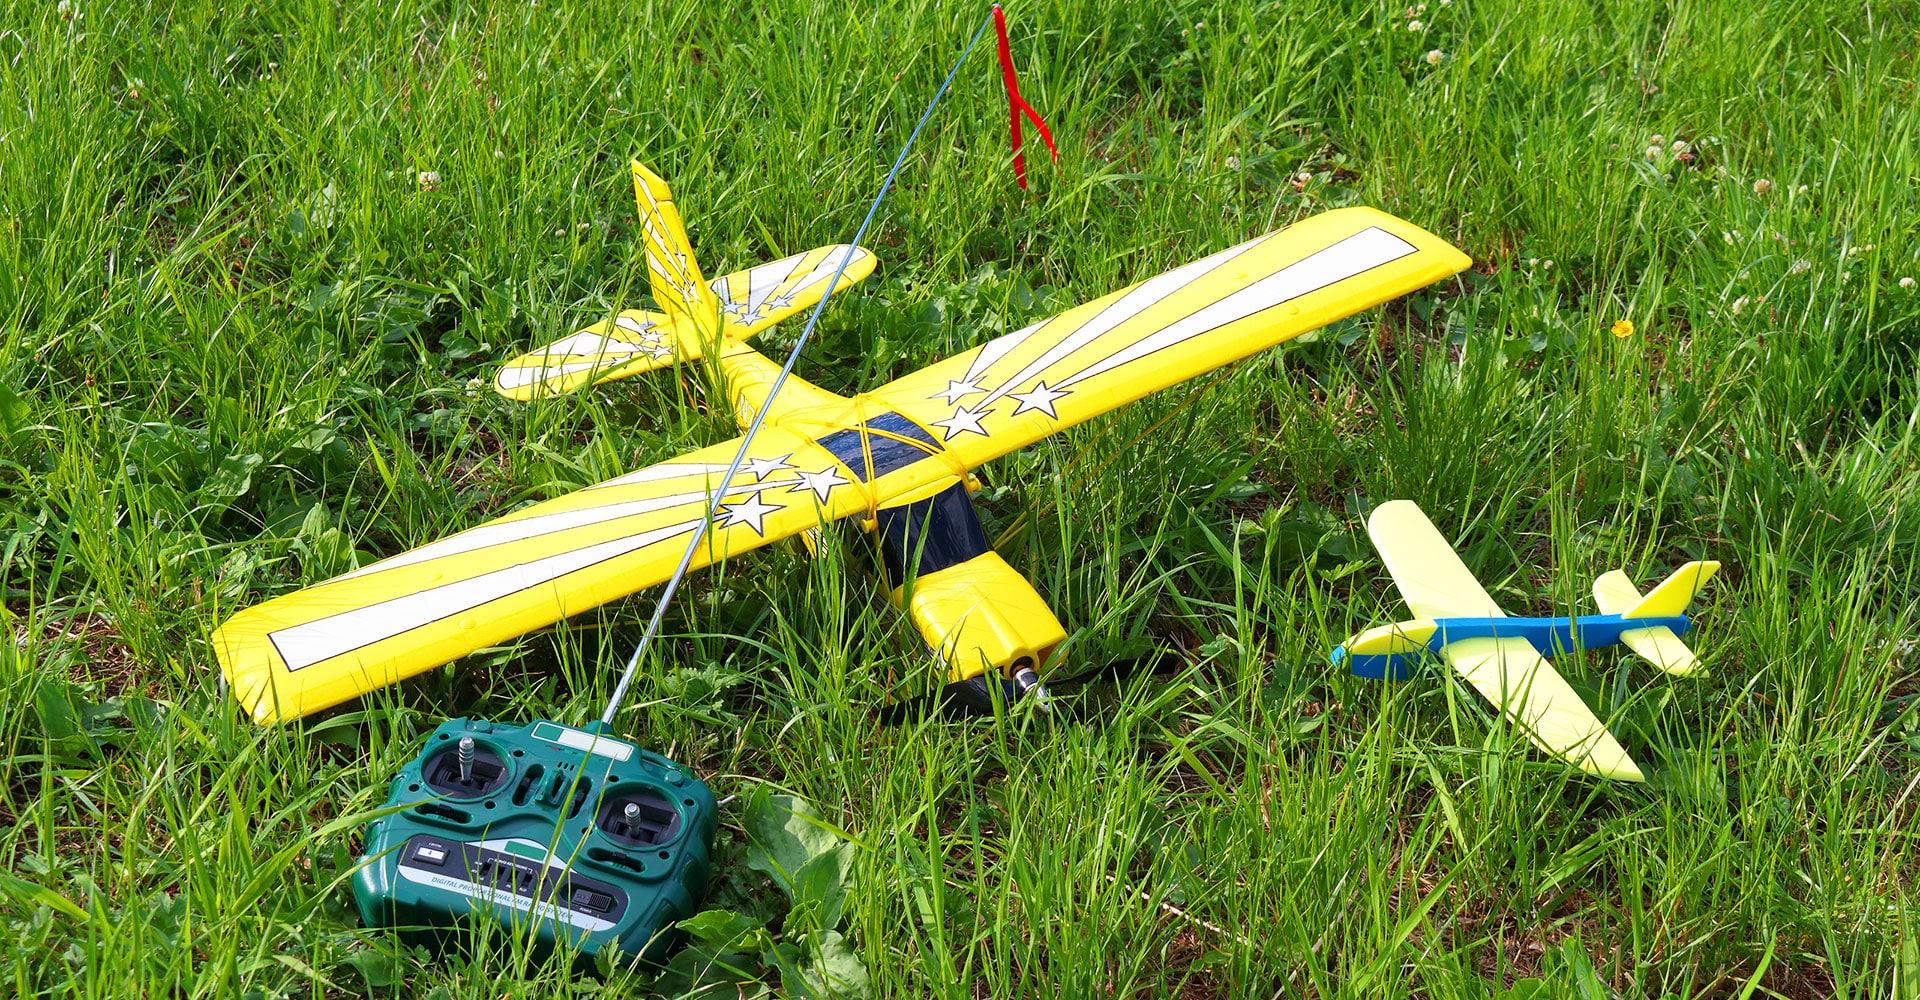 modellflugzeug-urlaub-suedtirol